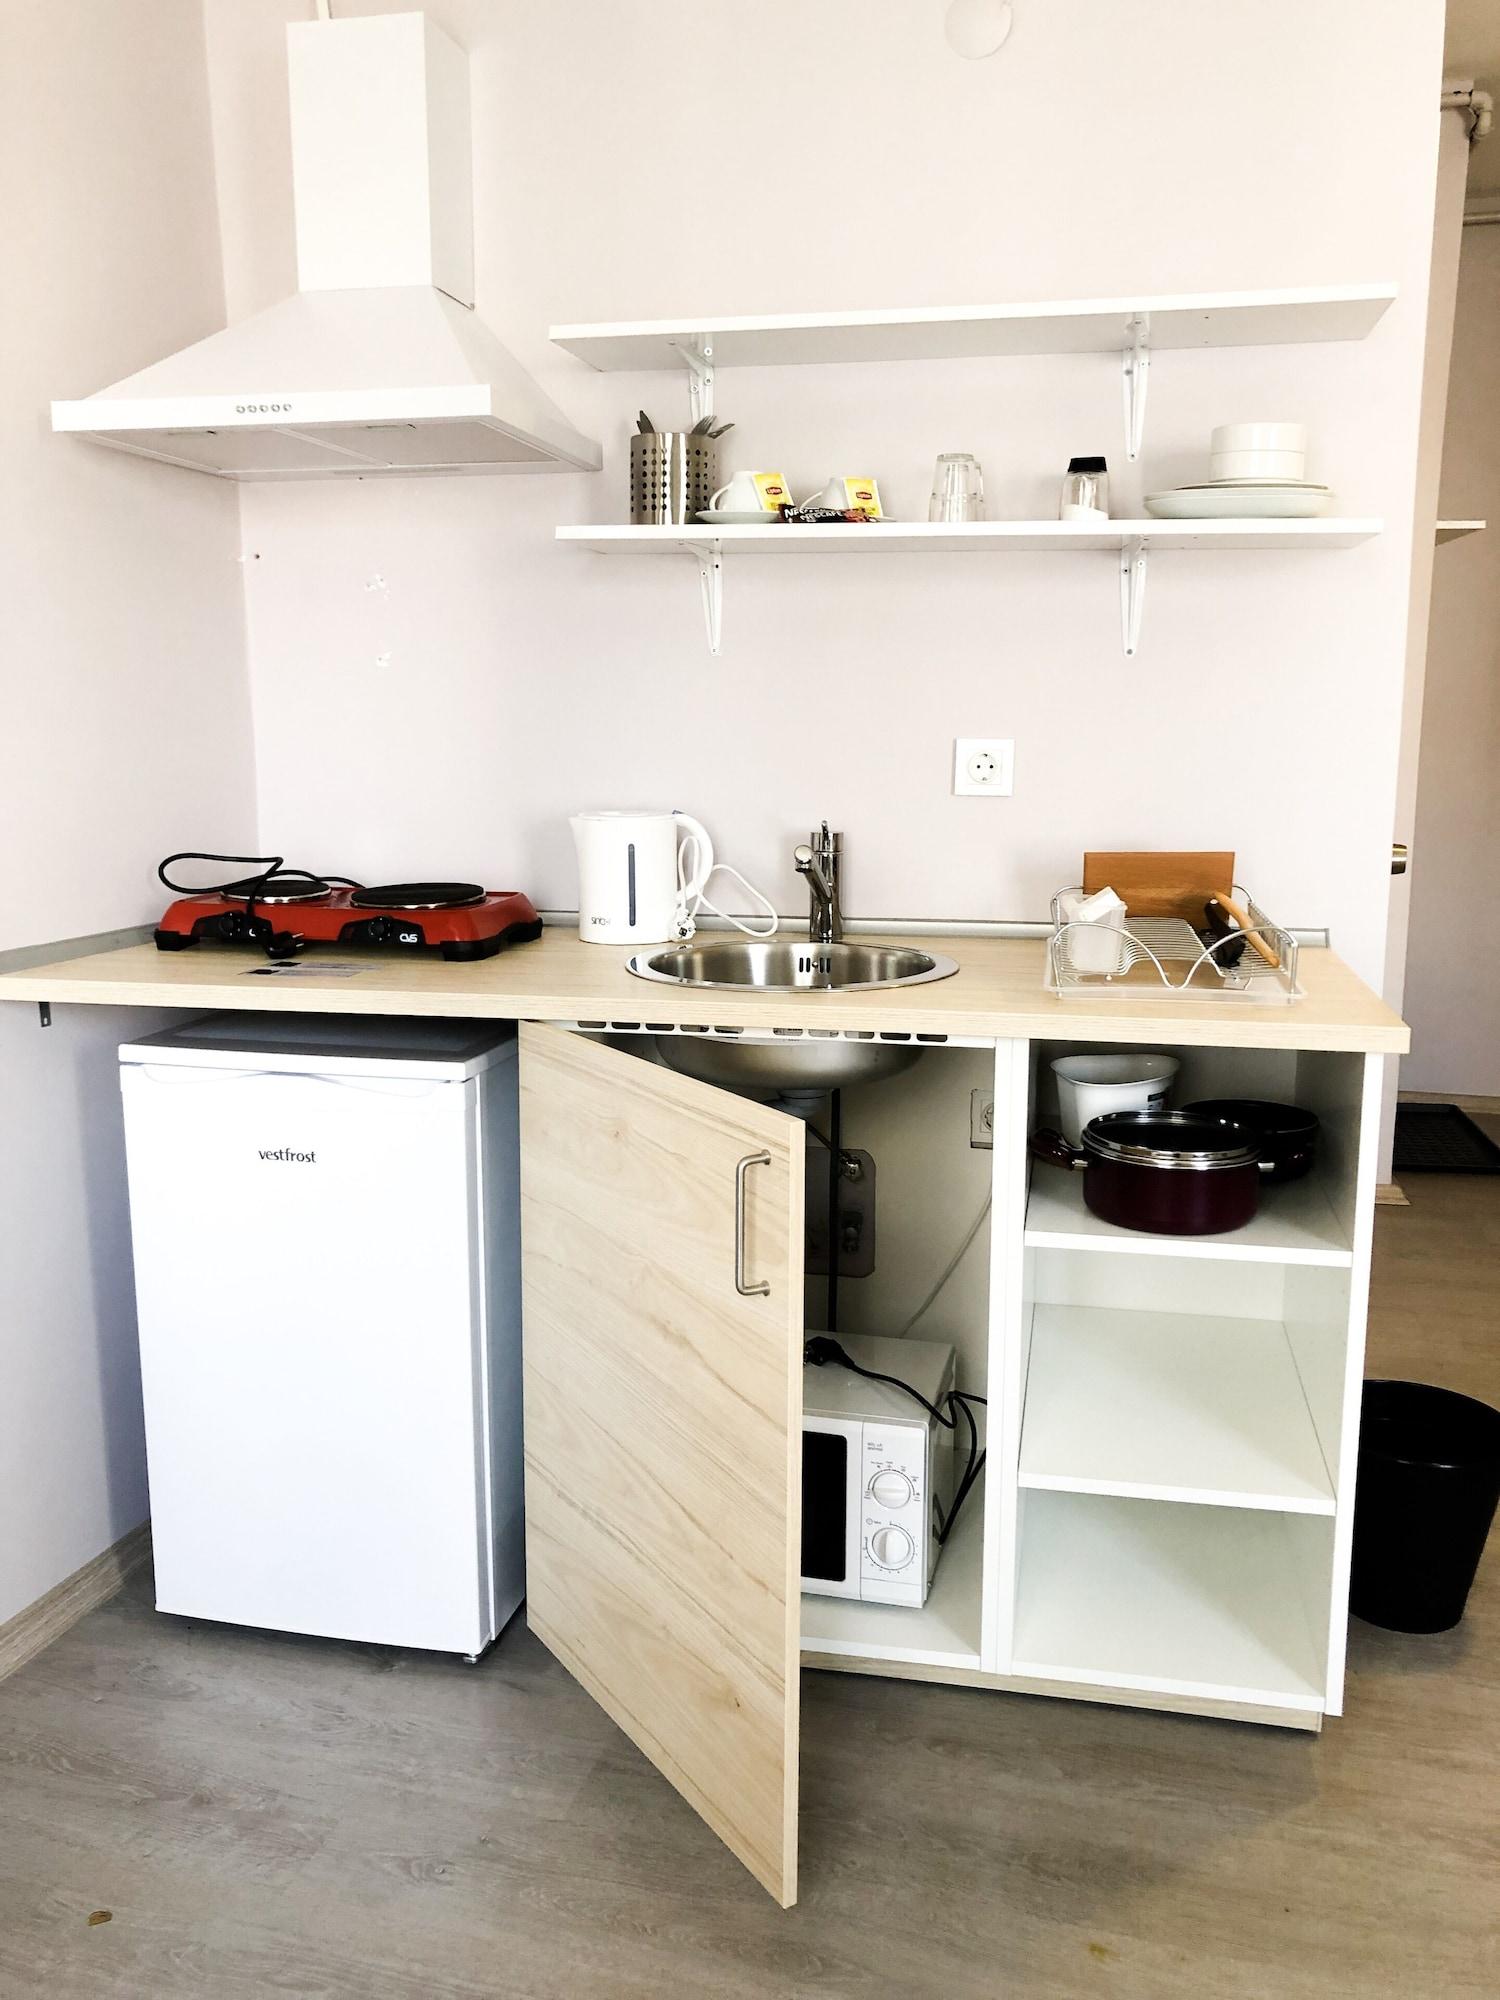 6 Hane Uskudar Serviced Apartments, Üsküdar